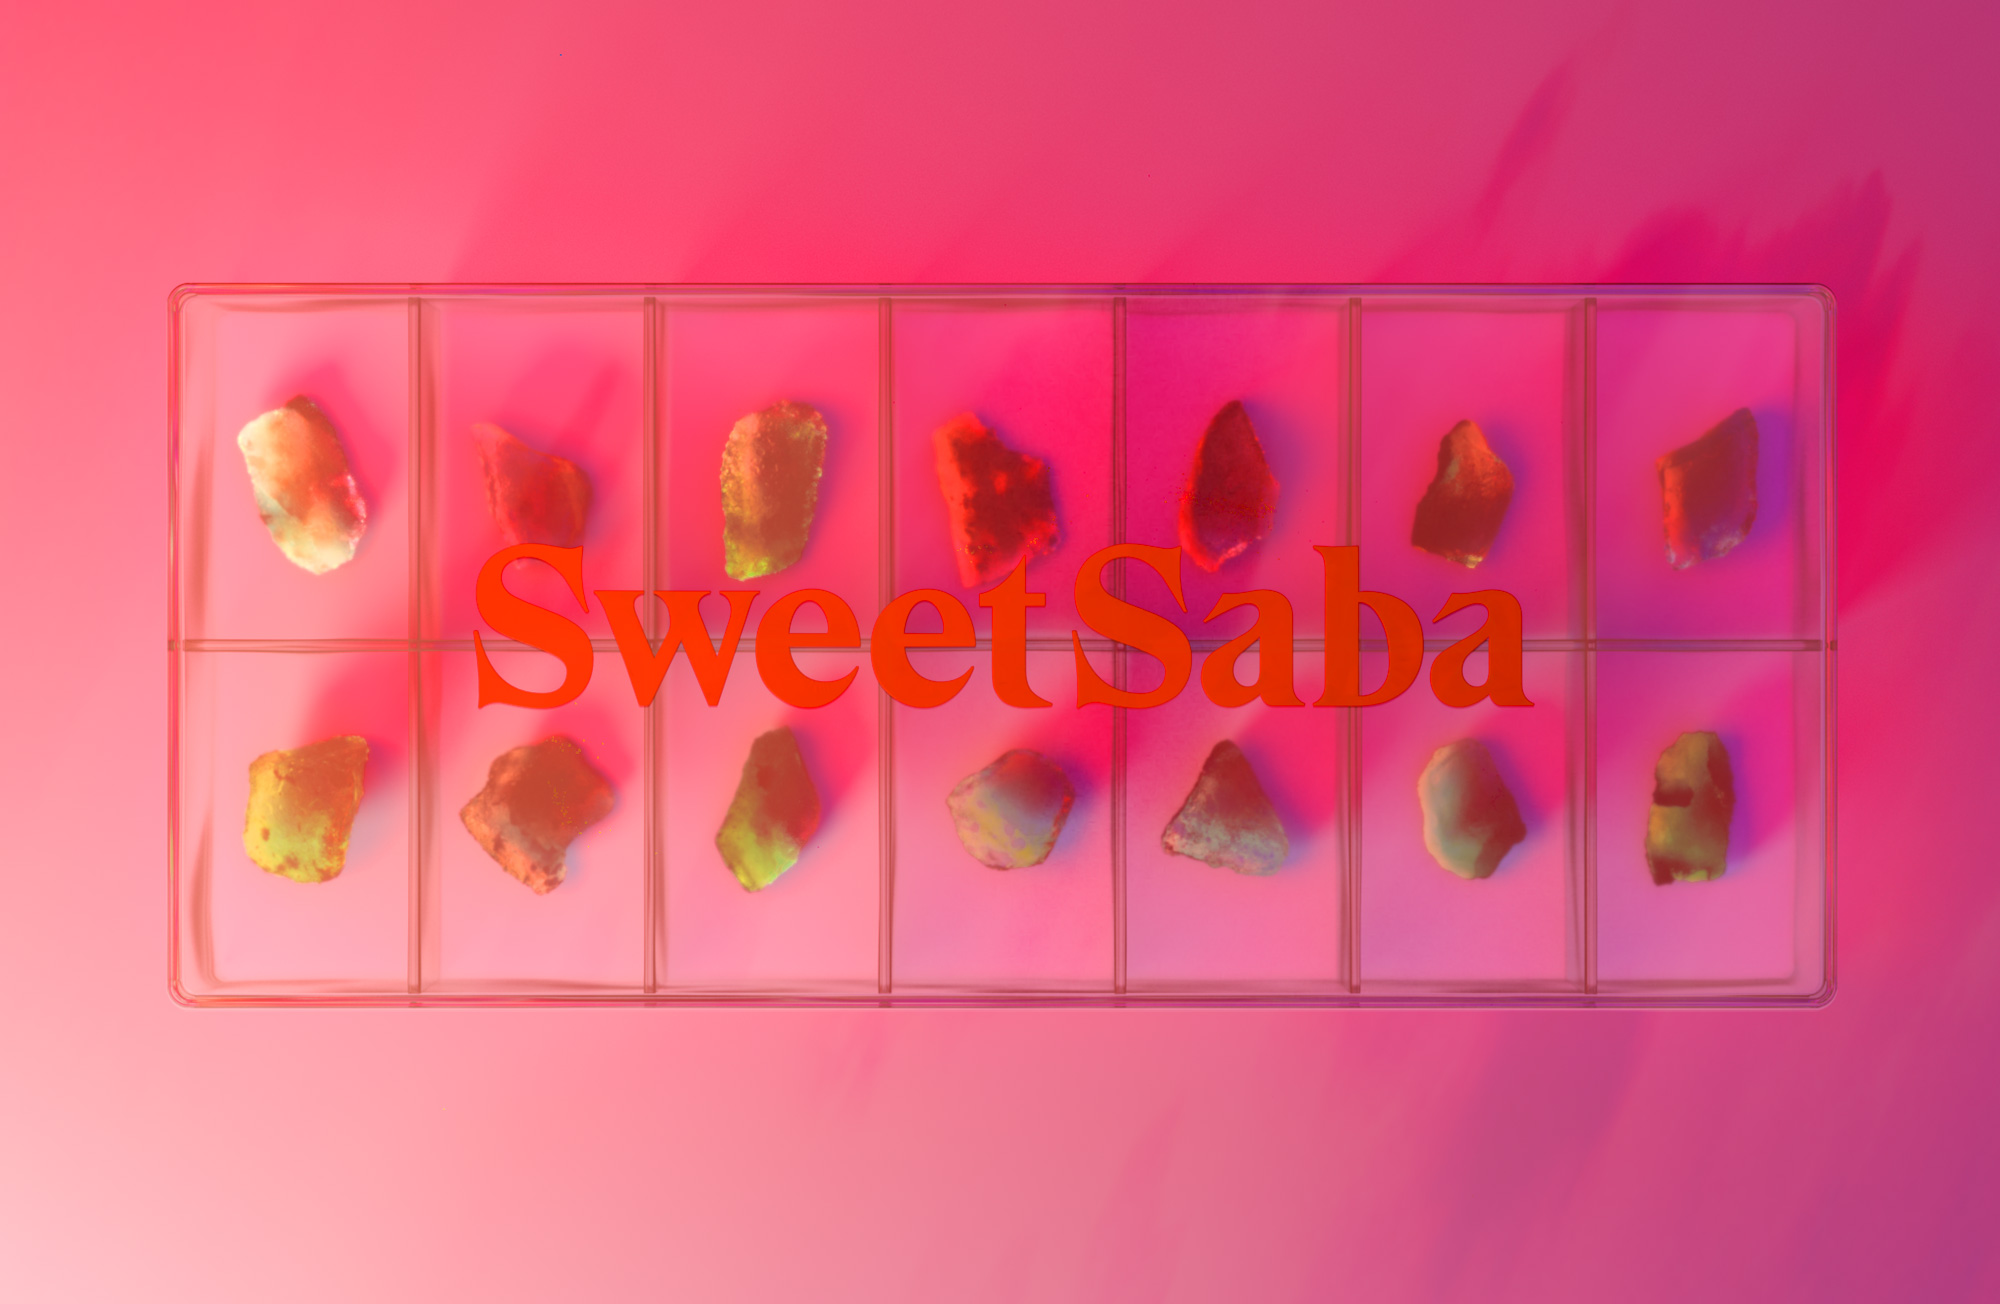 Identity Design for Sweet Saba by Maayan Zilberman